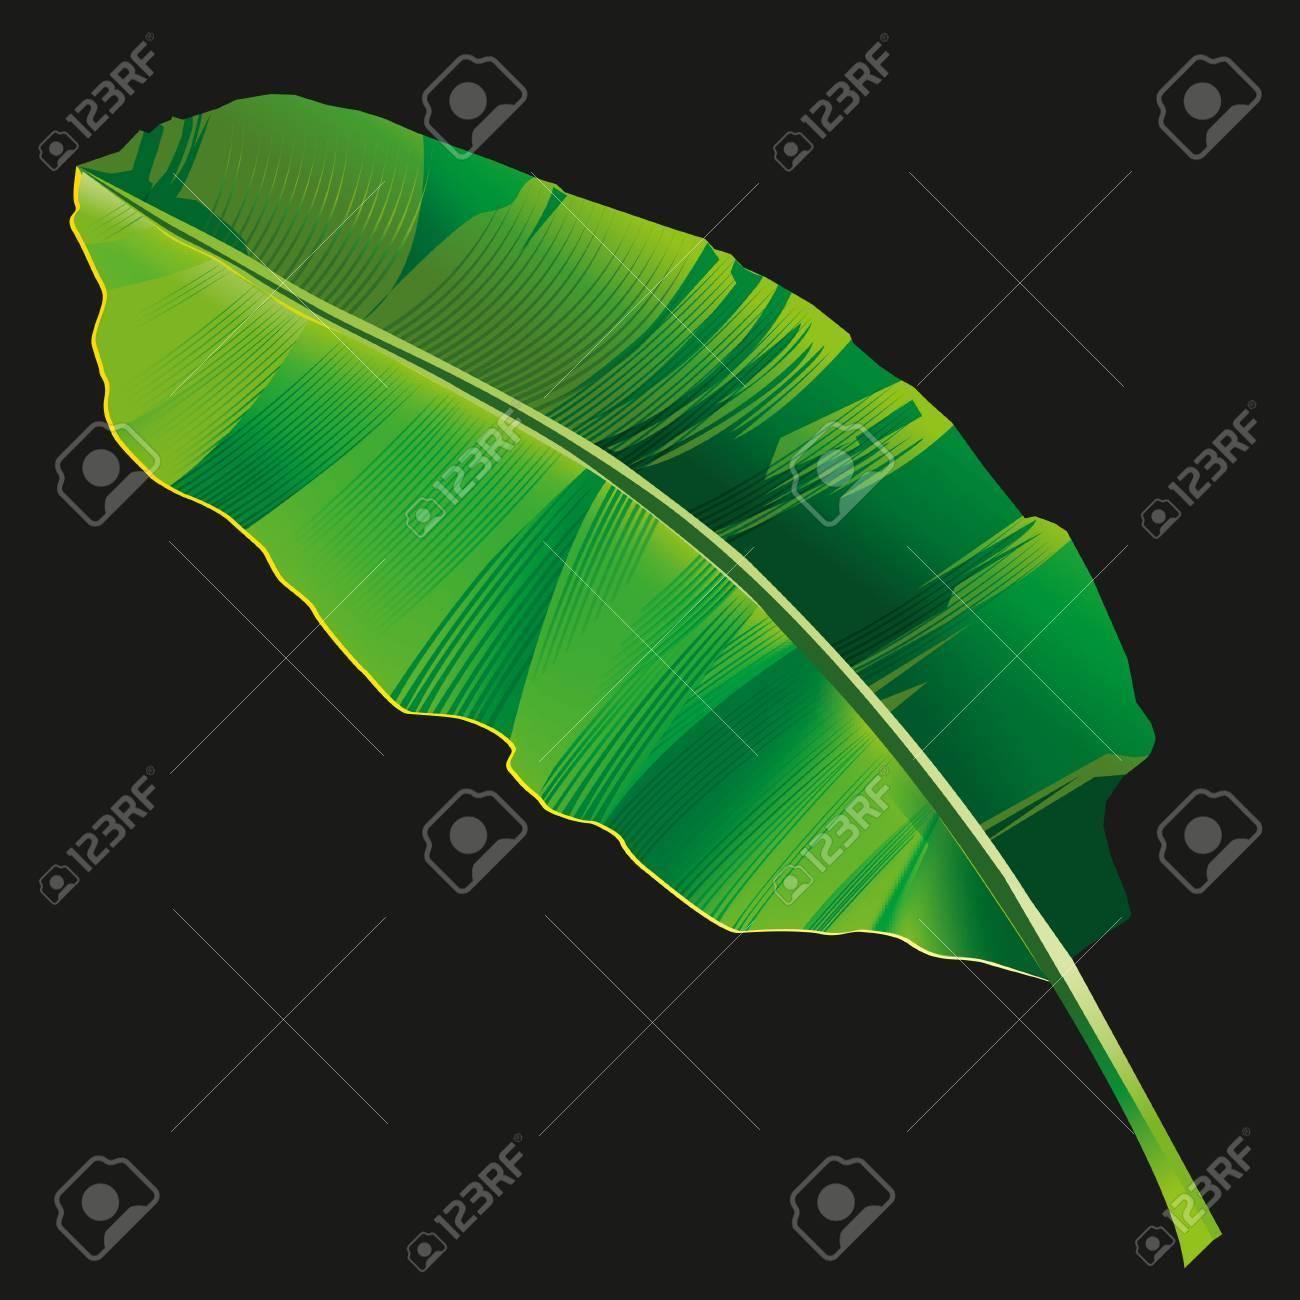 Banana leaf vector isolated on black background. - 80331094